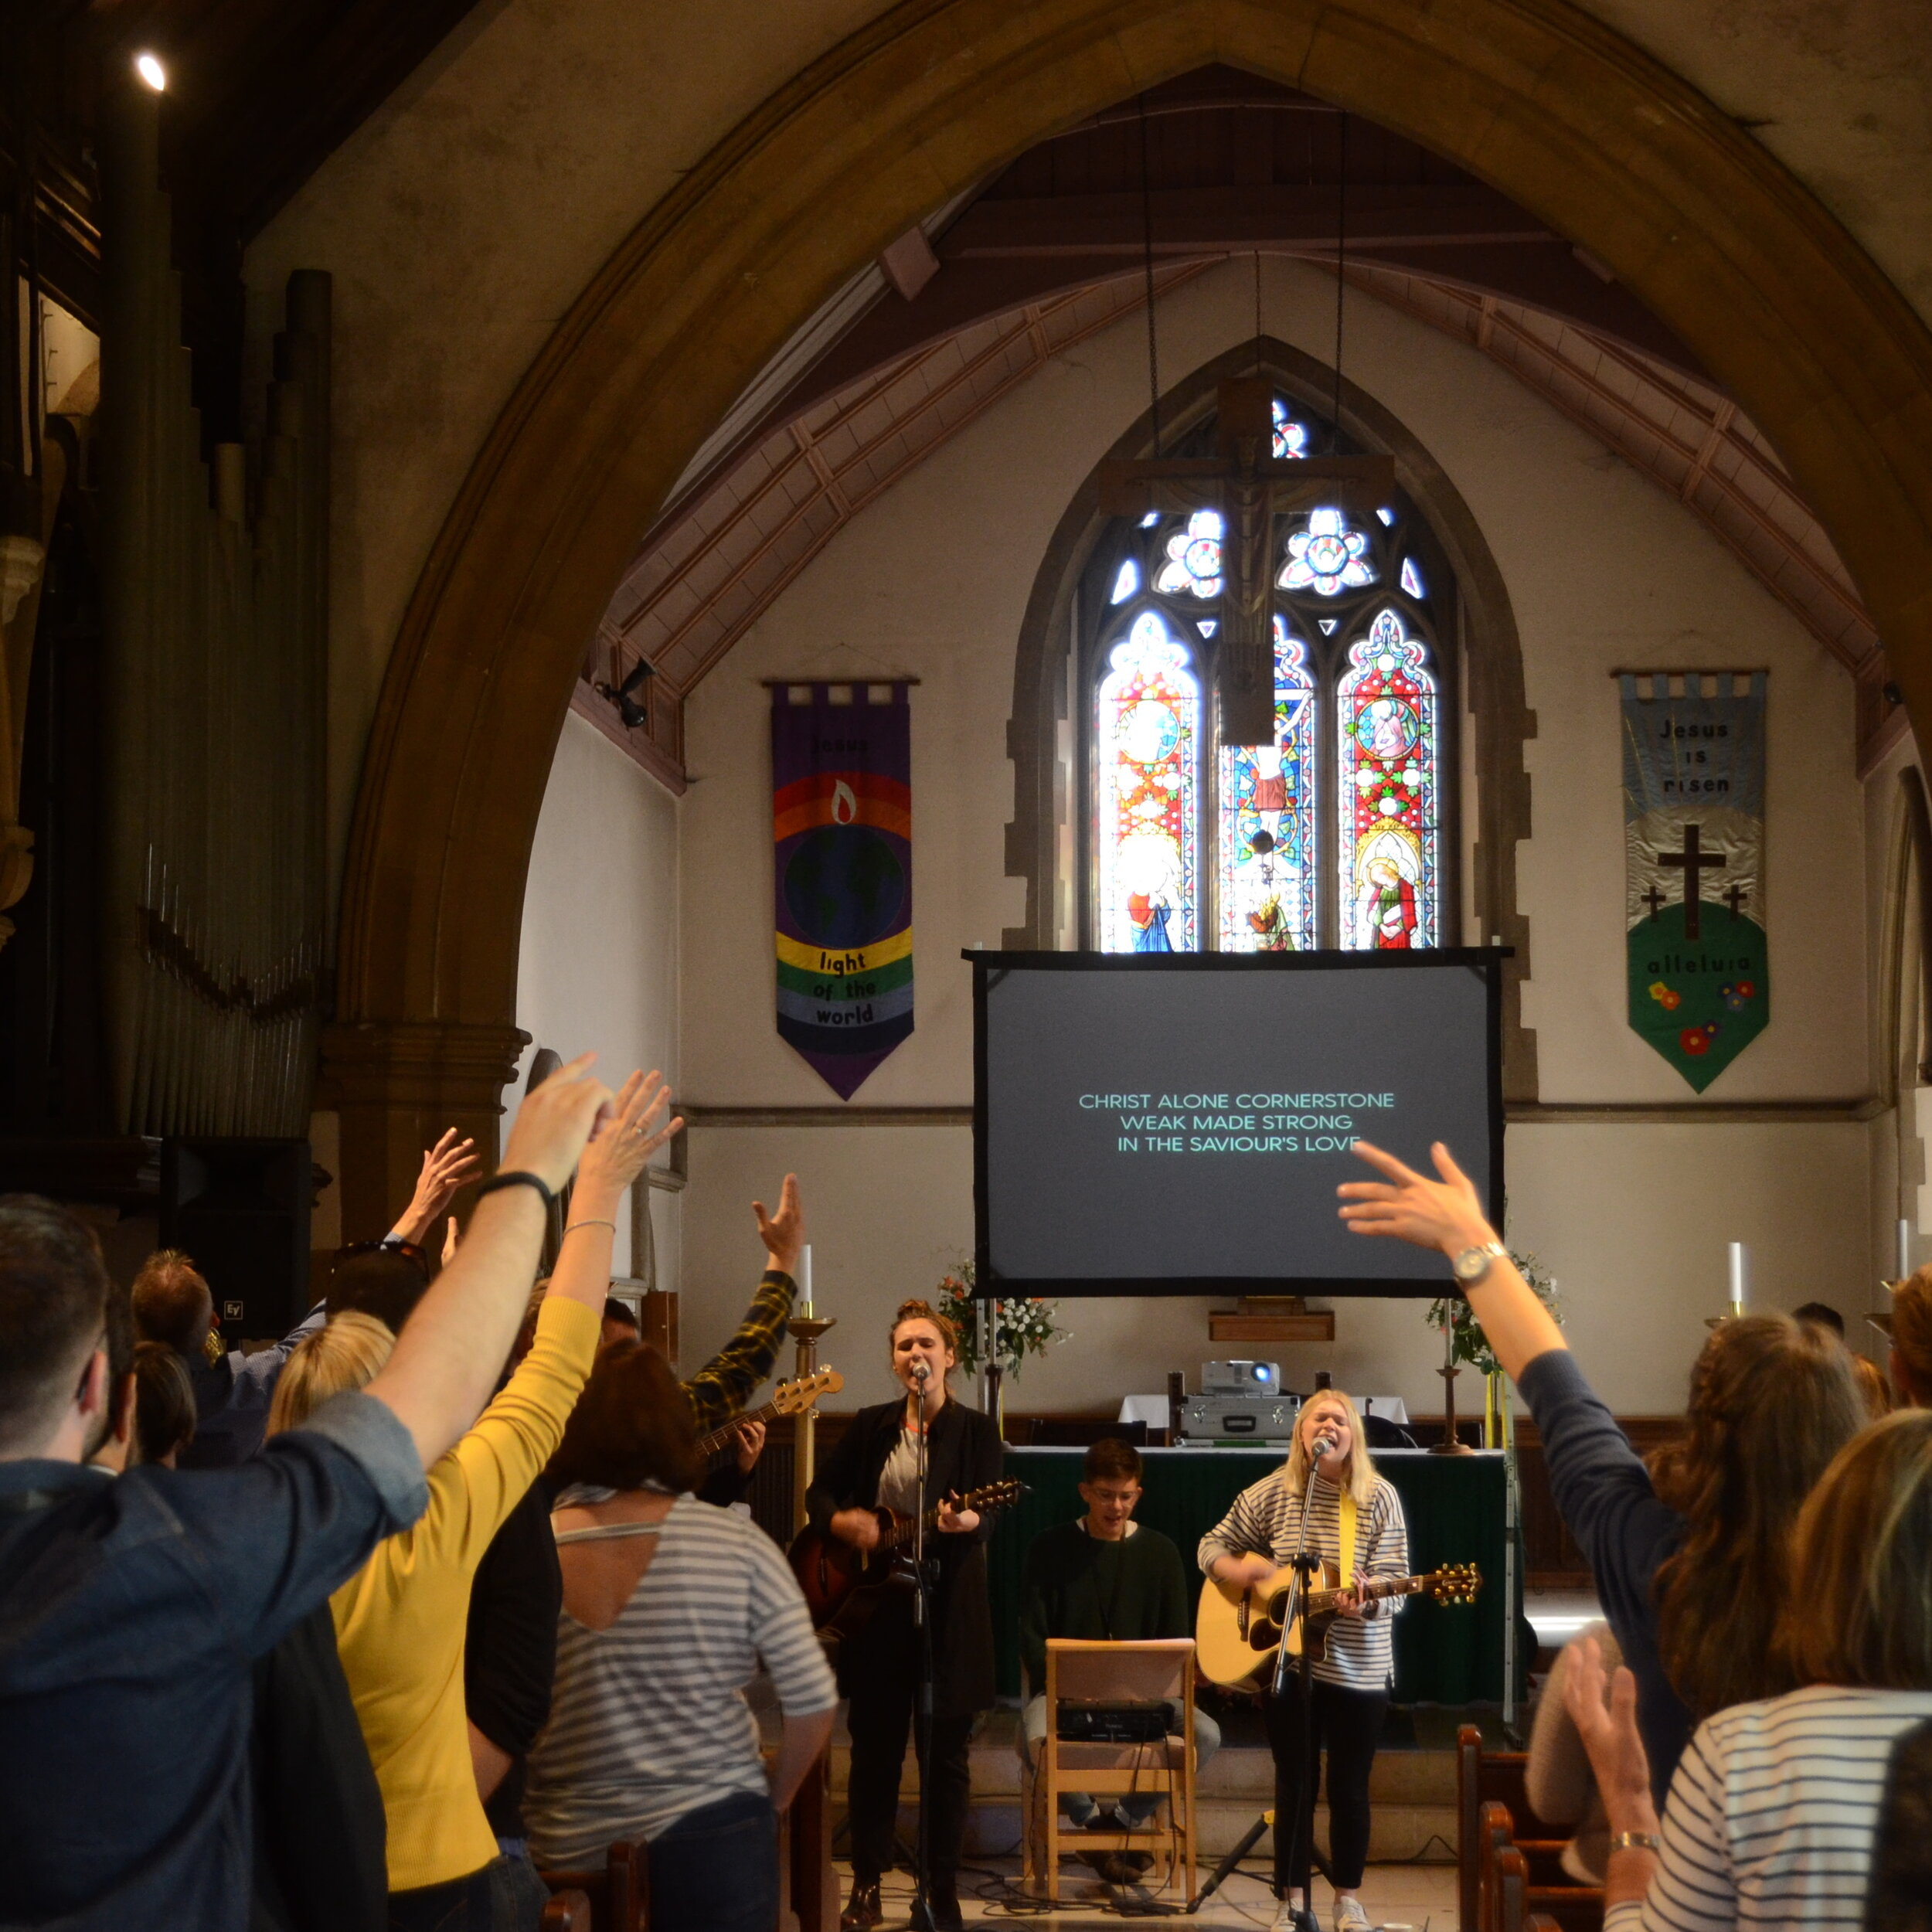 St John's Crawley - Watch their 2017 Launch video